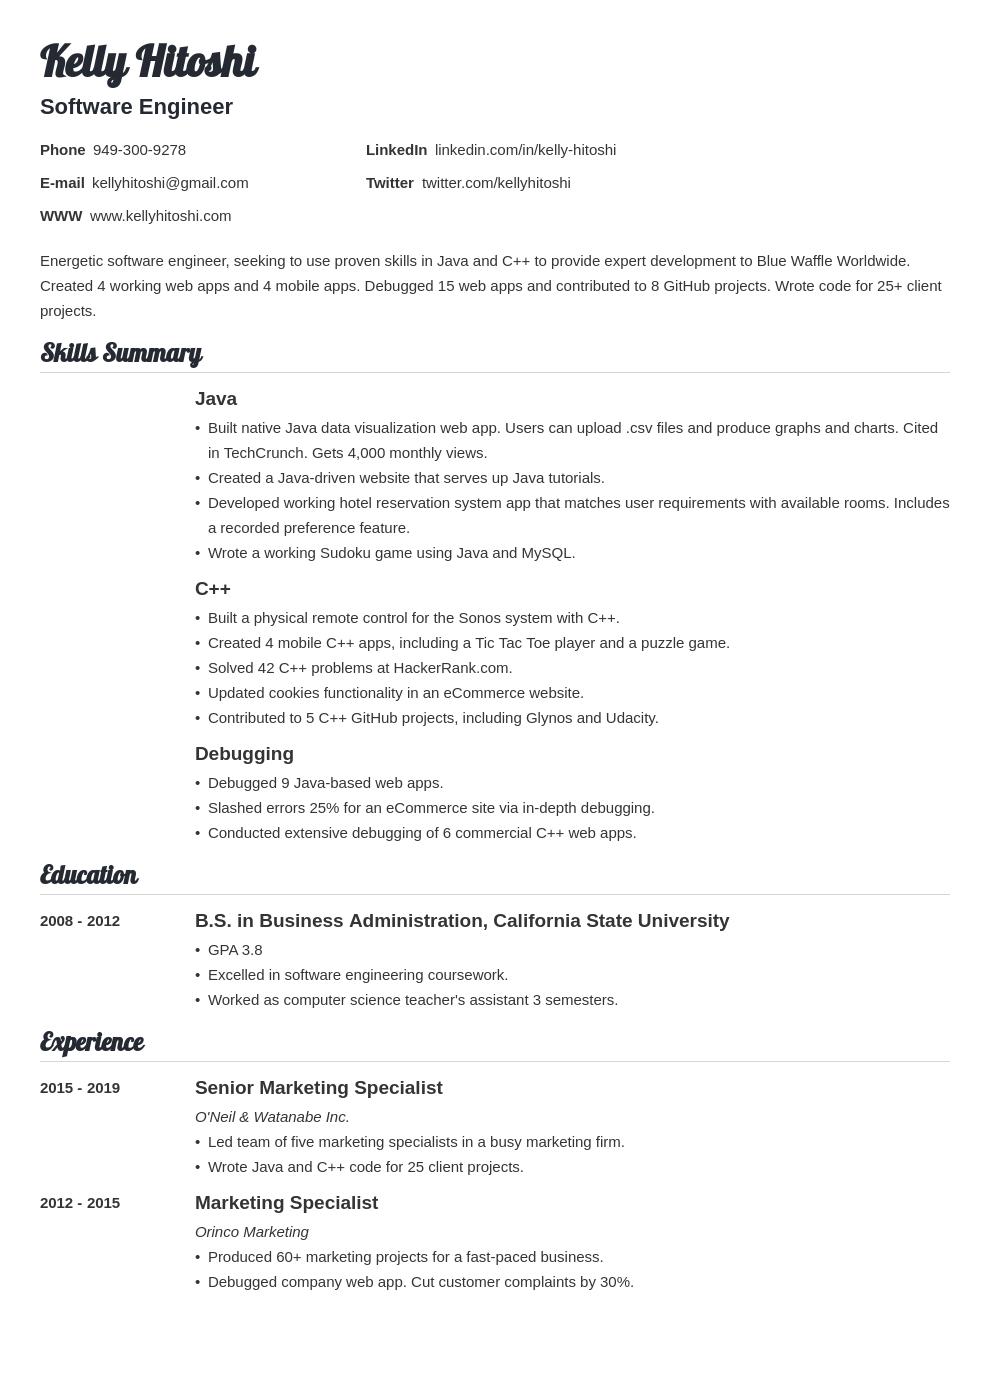 resume career change template valera uk